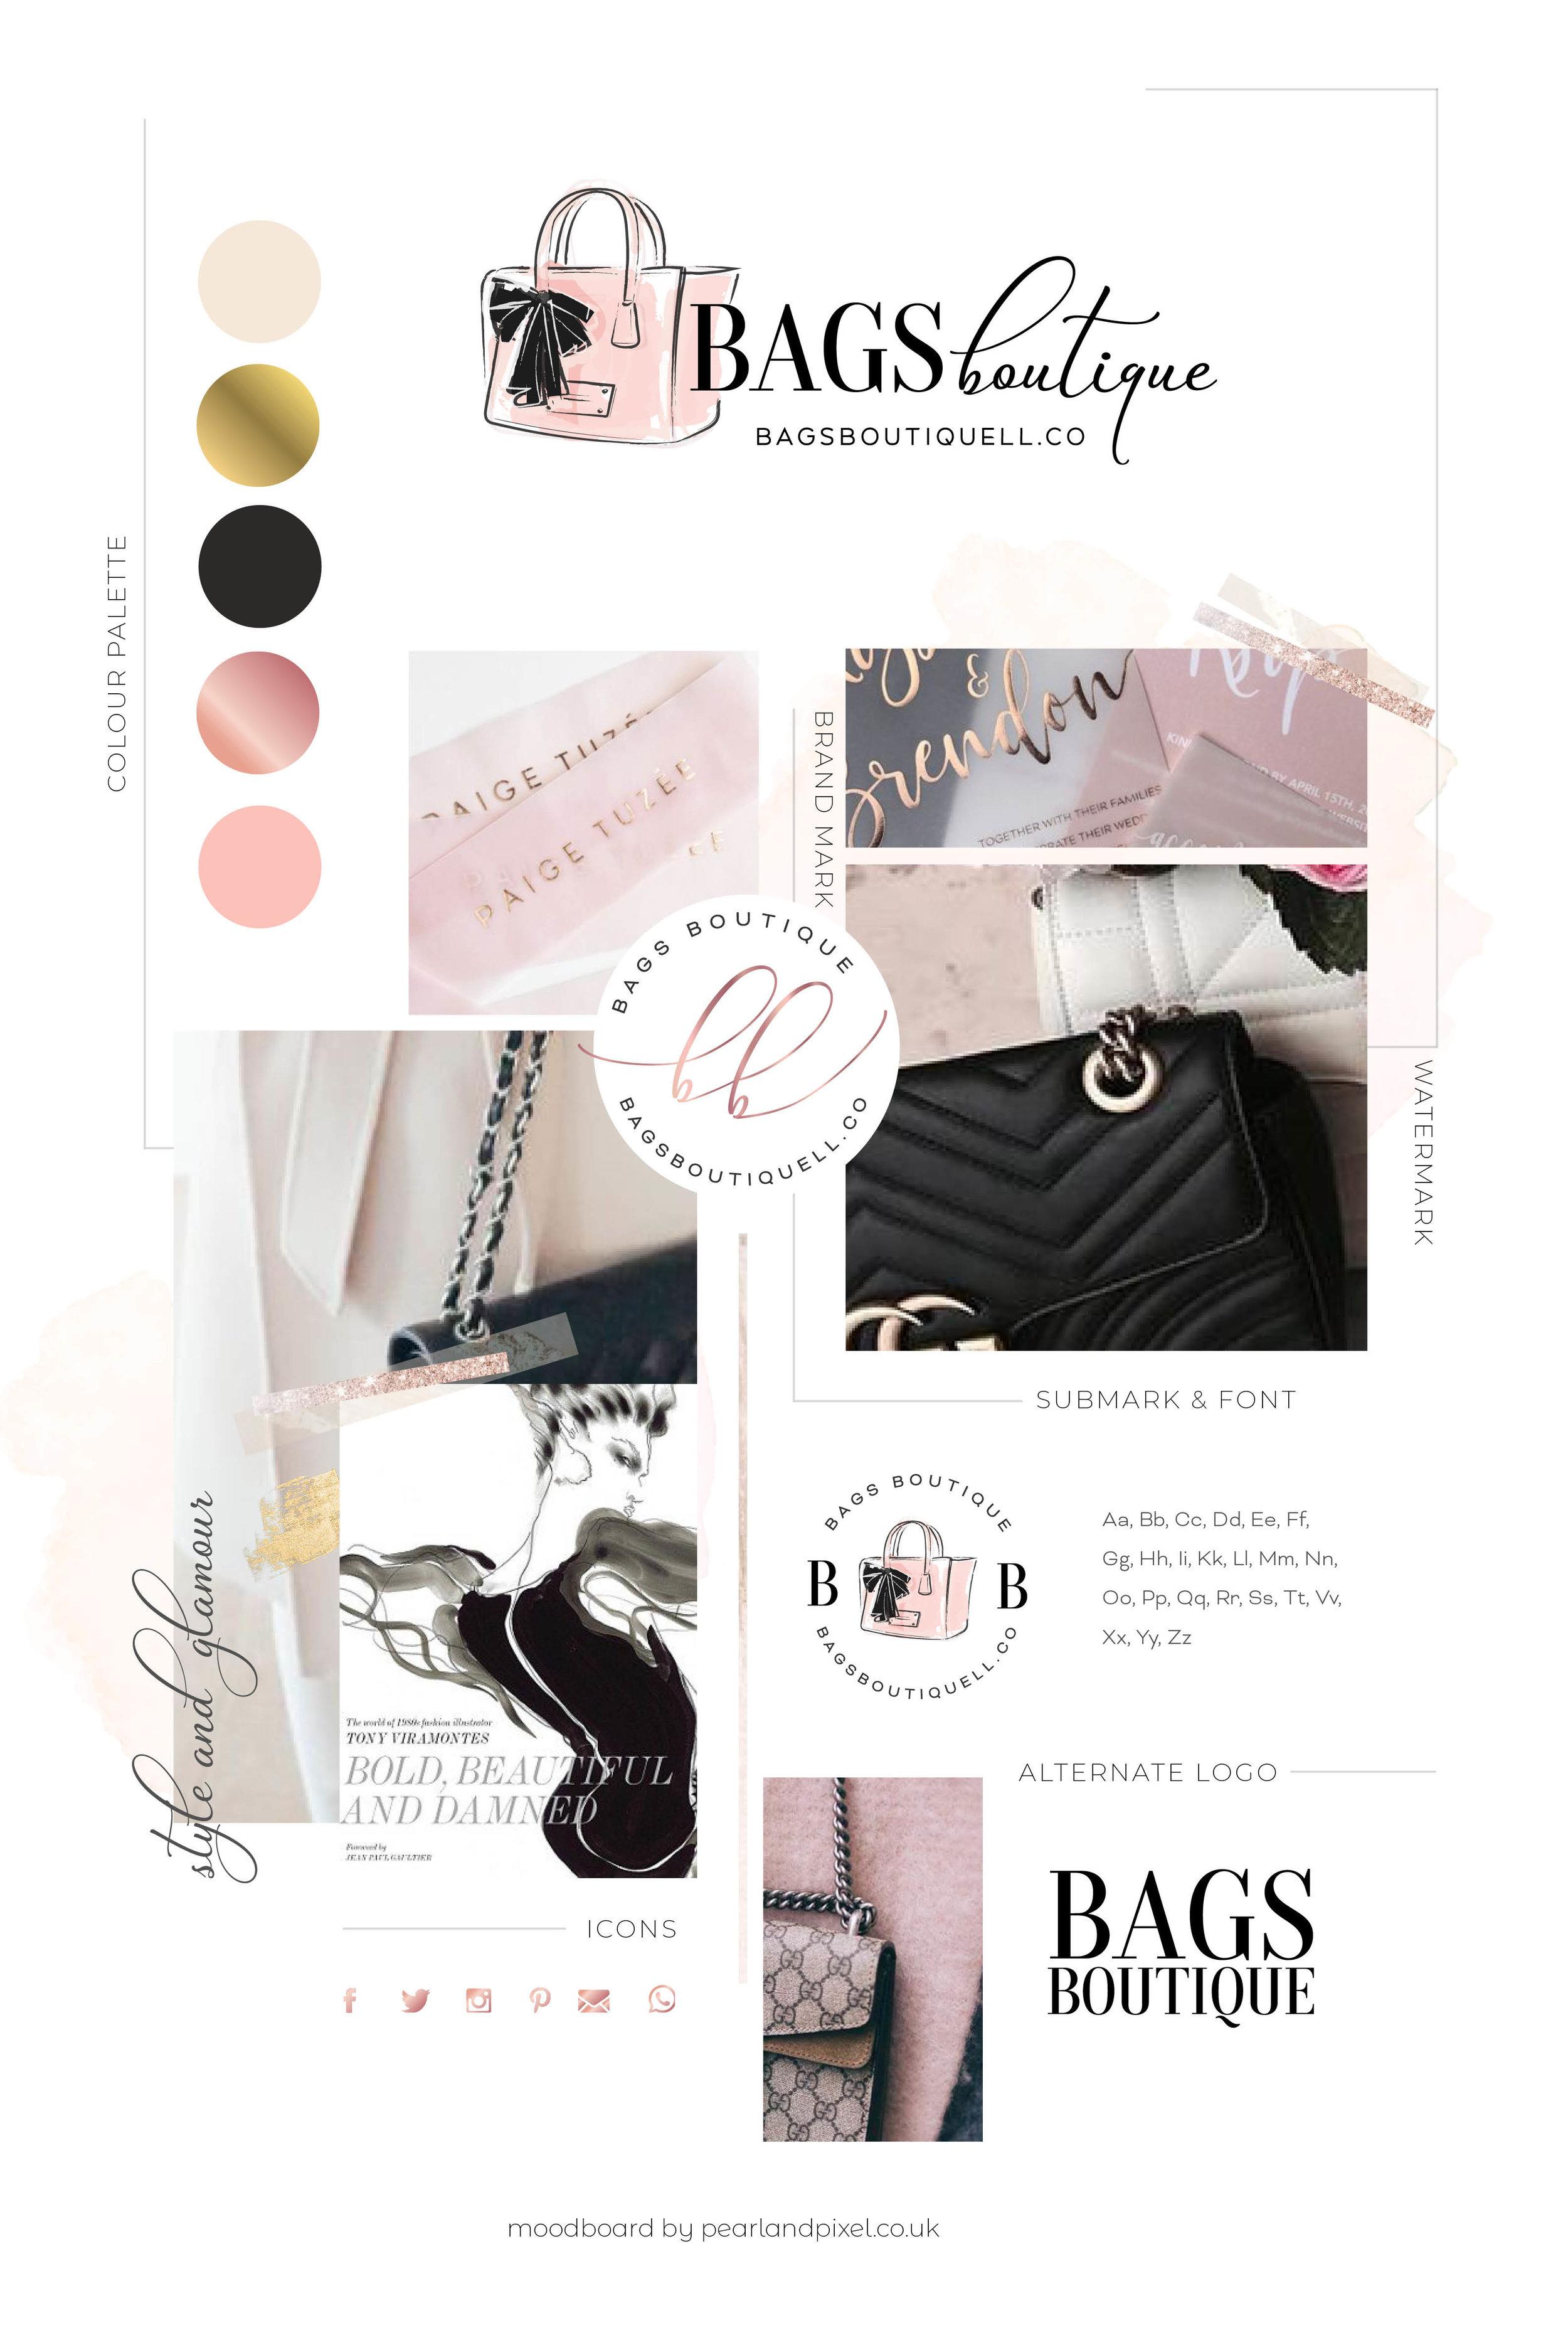 bags boutique branding.jpg